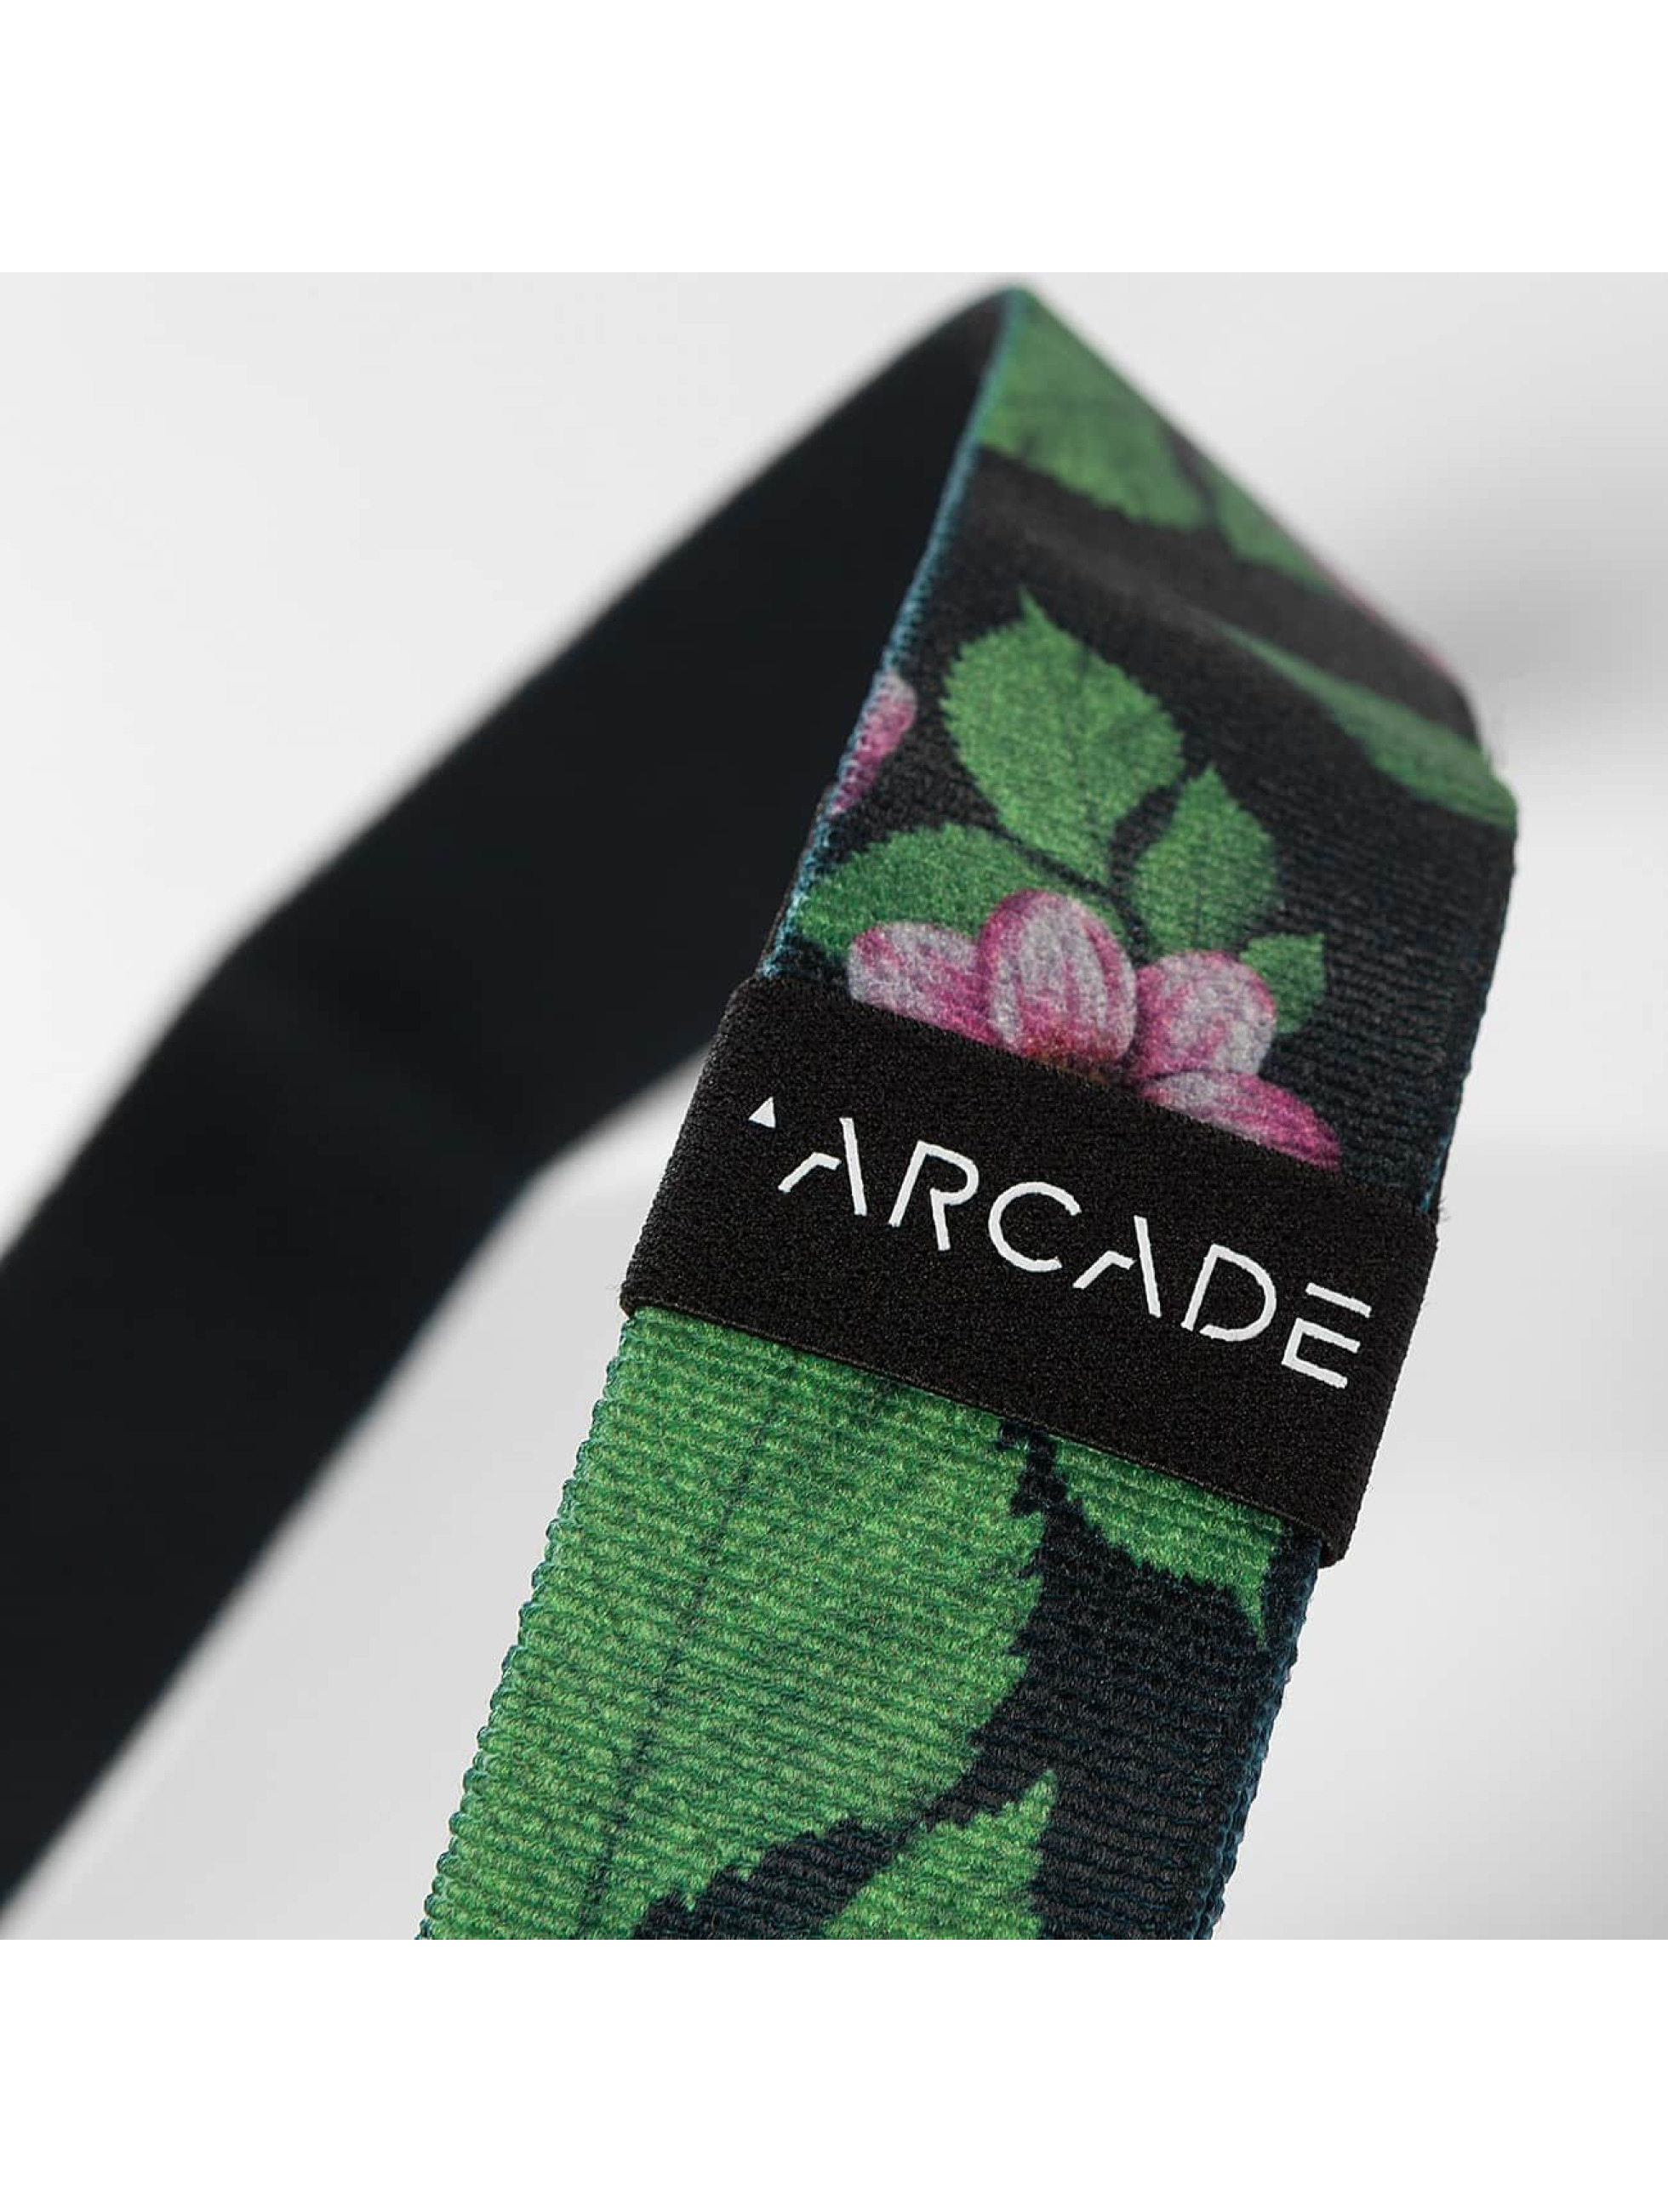 ARCADE Vyöt Native Collection Biscayne musta